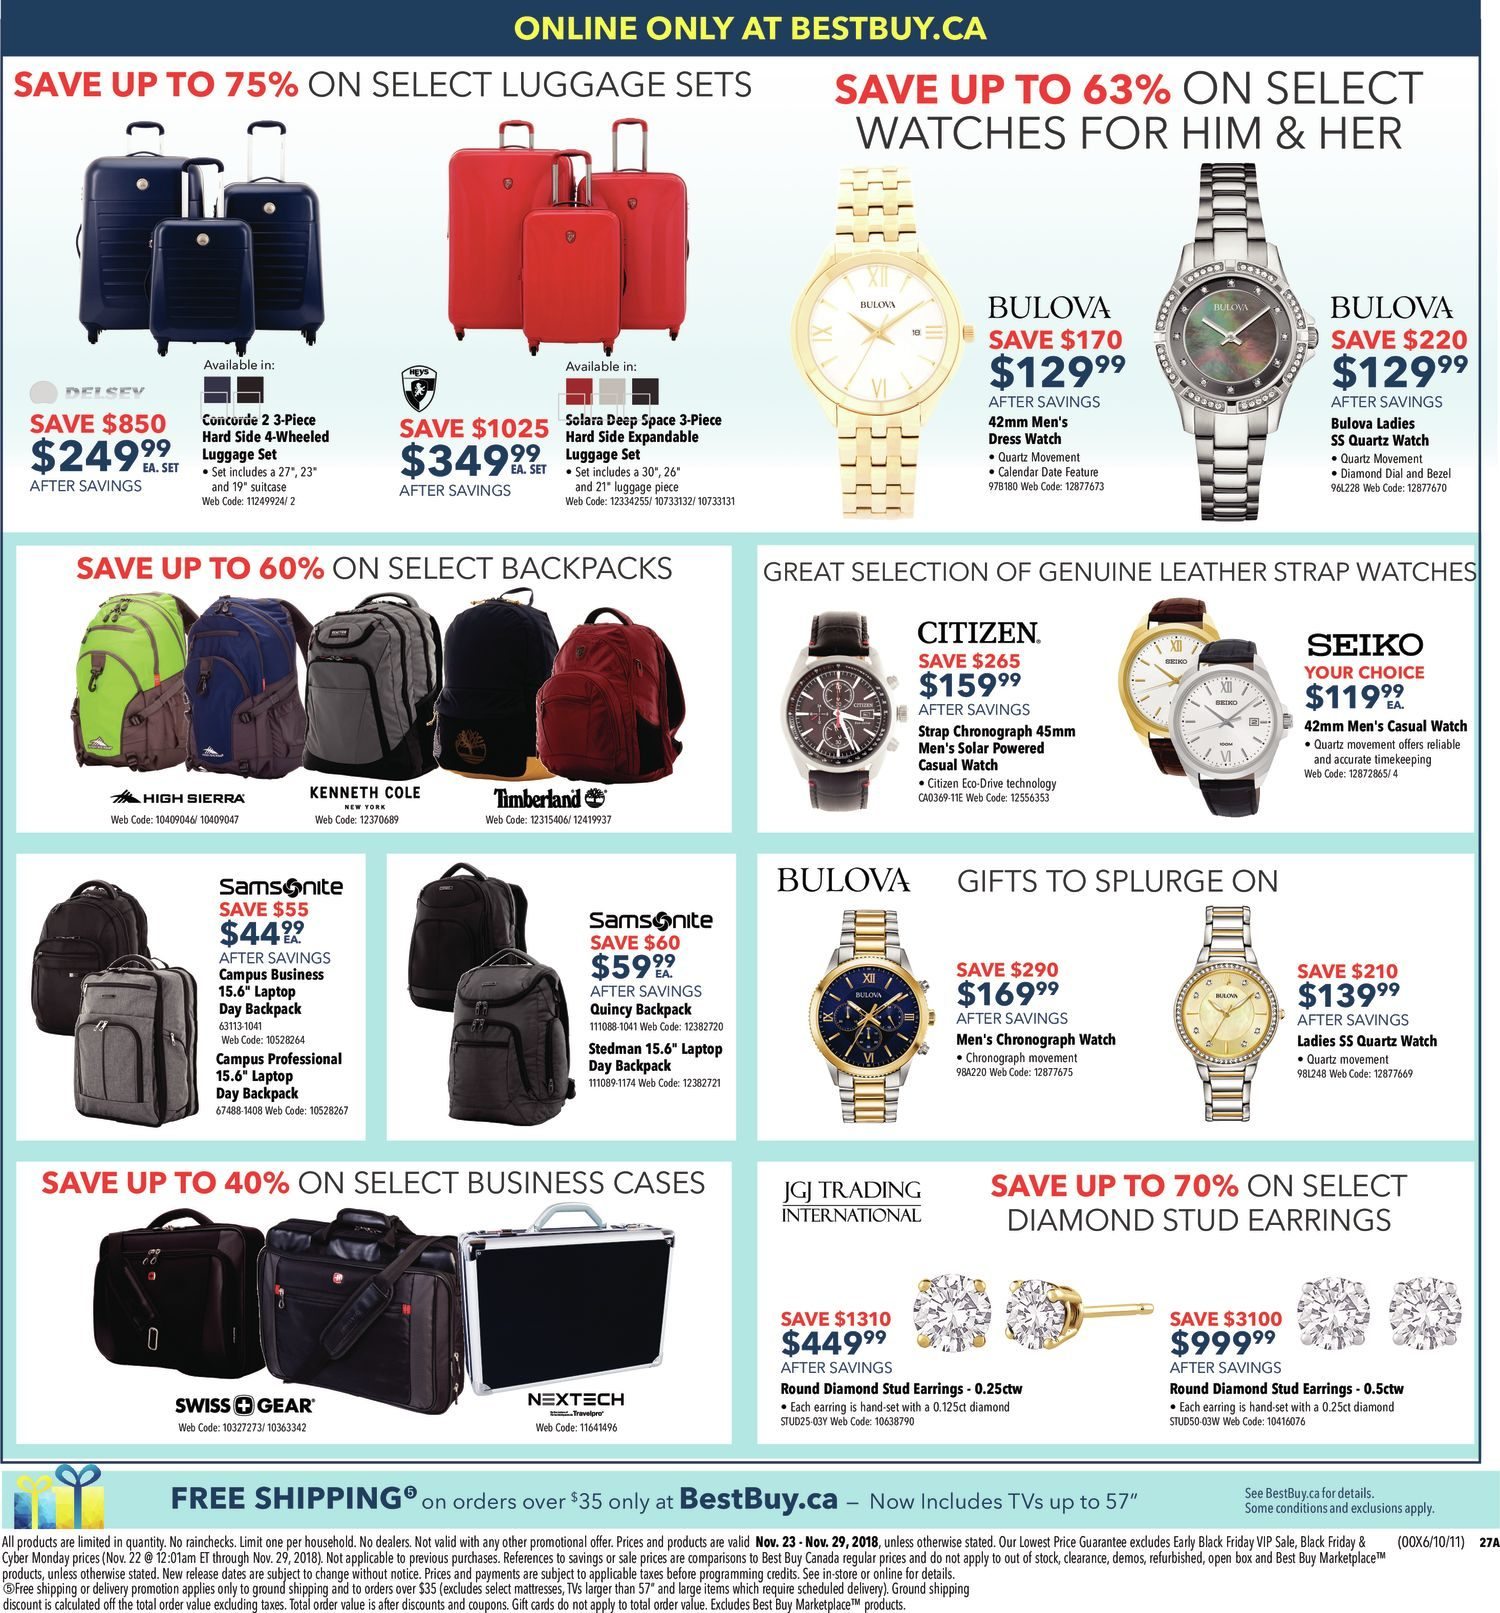 e9156bda7e5 Best Buy Weekly Flyer - Weekly - Black Friday Sale - Nov 23 – 29 -  RedFlagDeals.com